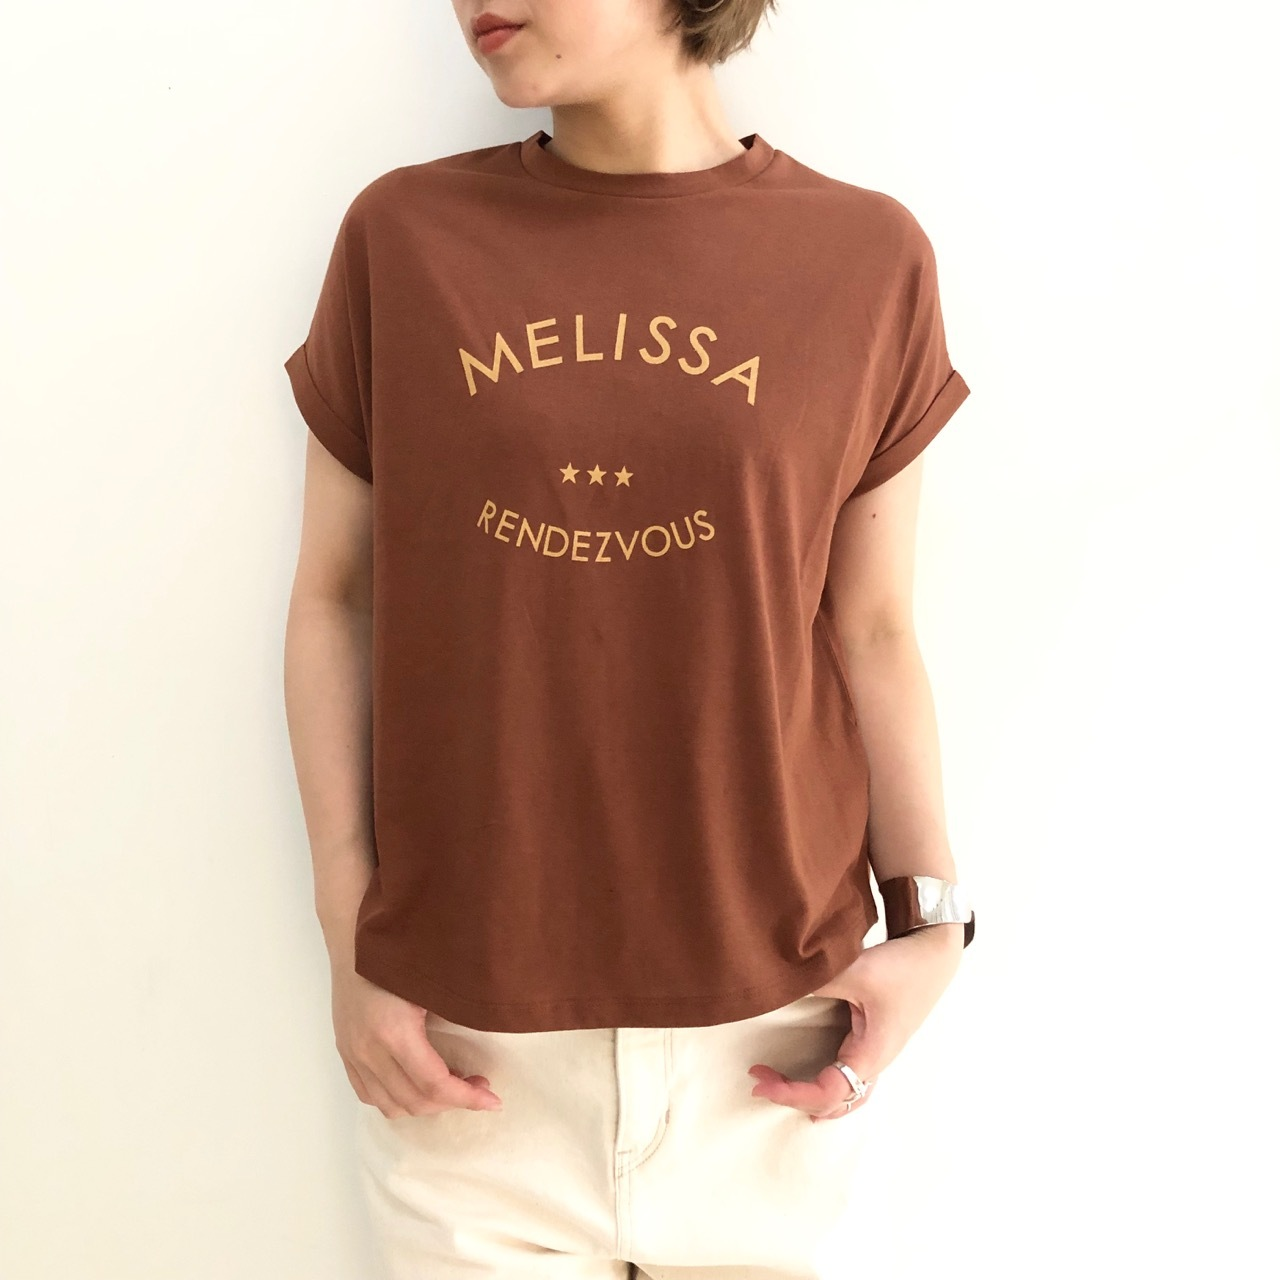 【 ROSIEE 】- 152602 - プリントTeeシャツ